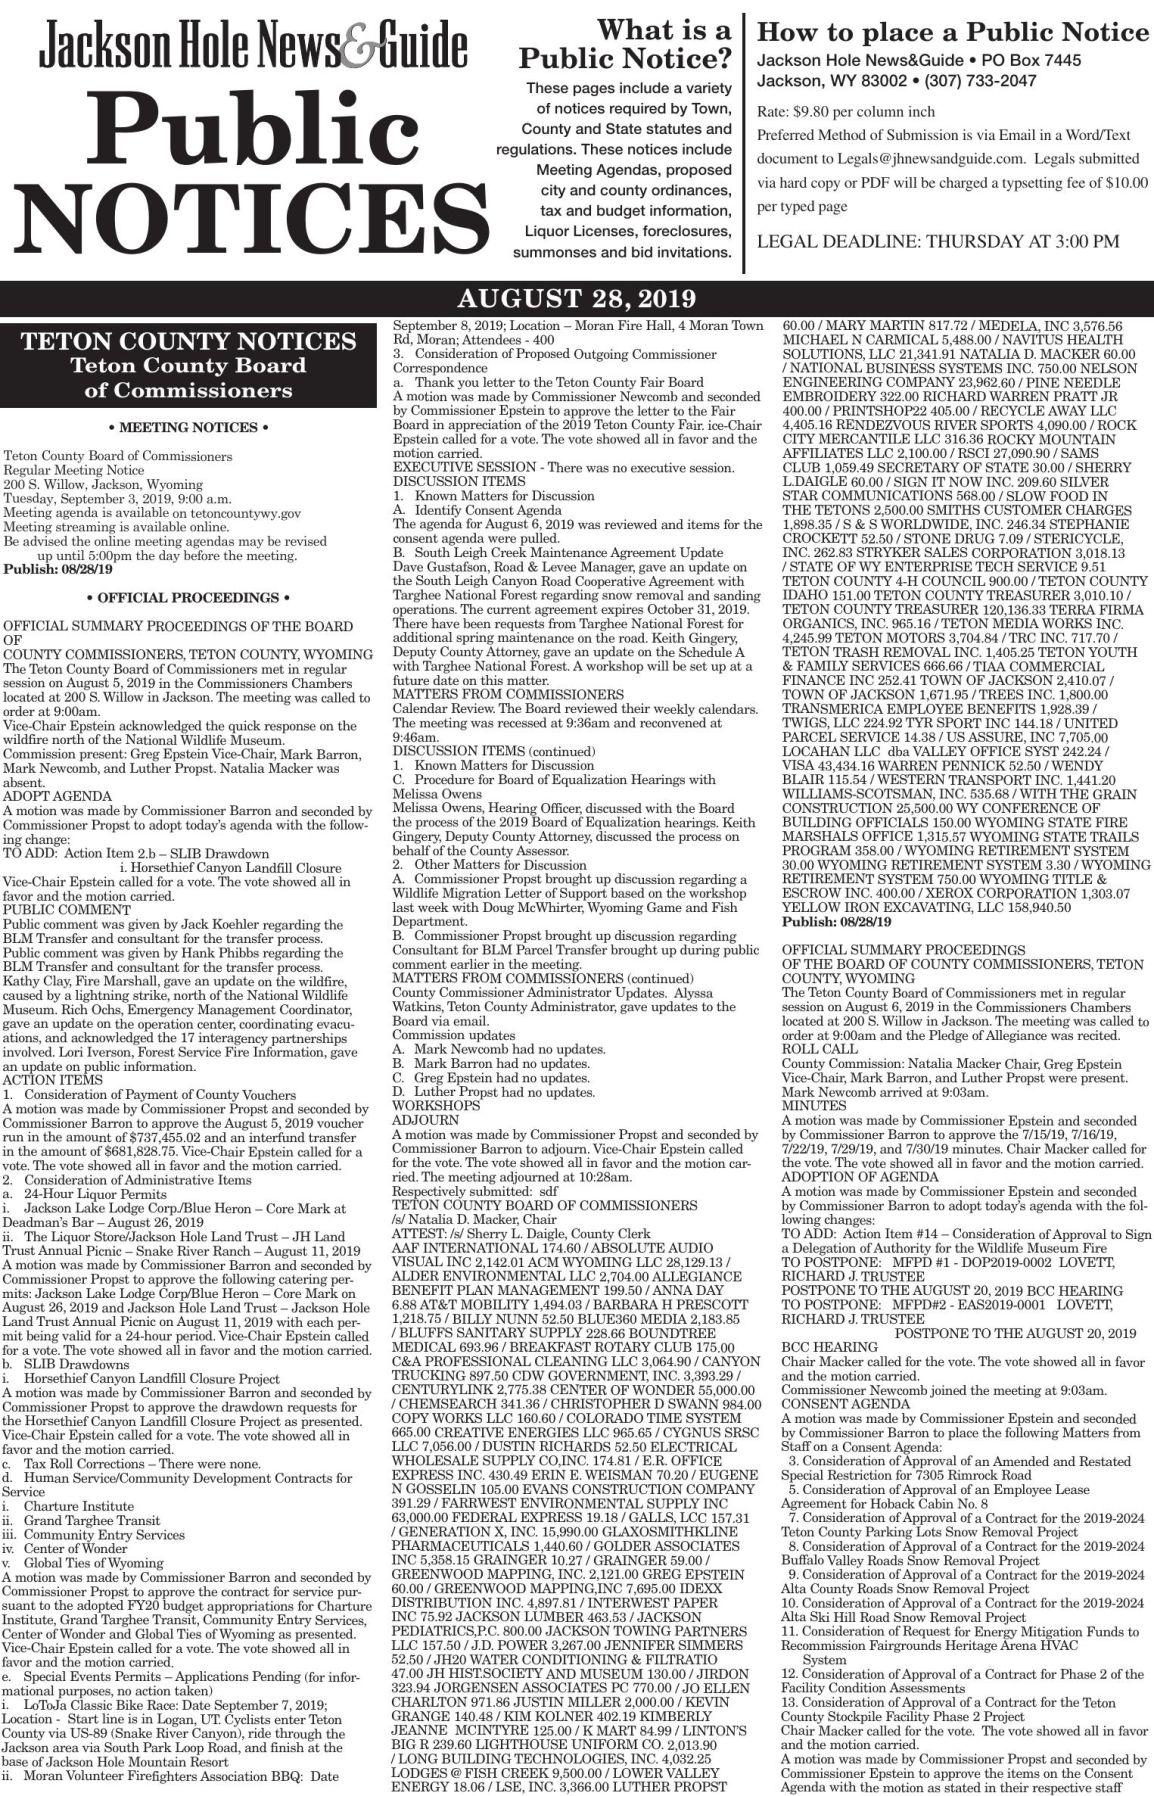 Public Notices, August 28, 2019